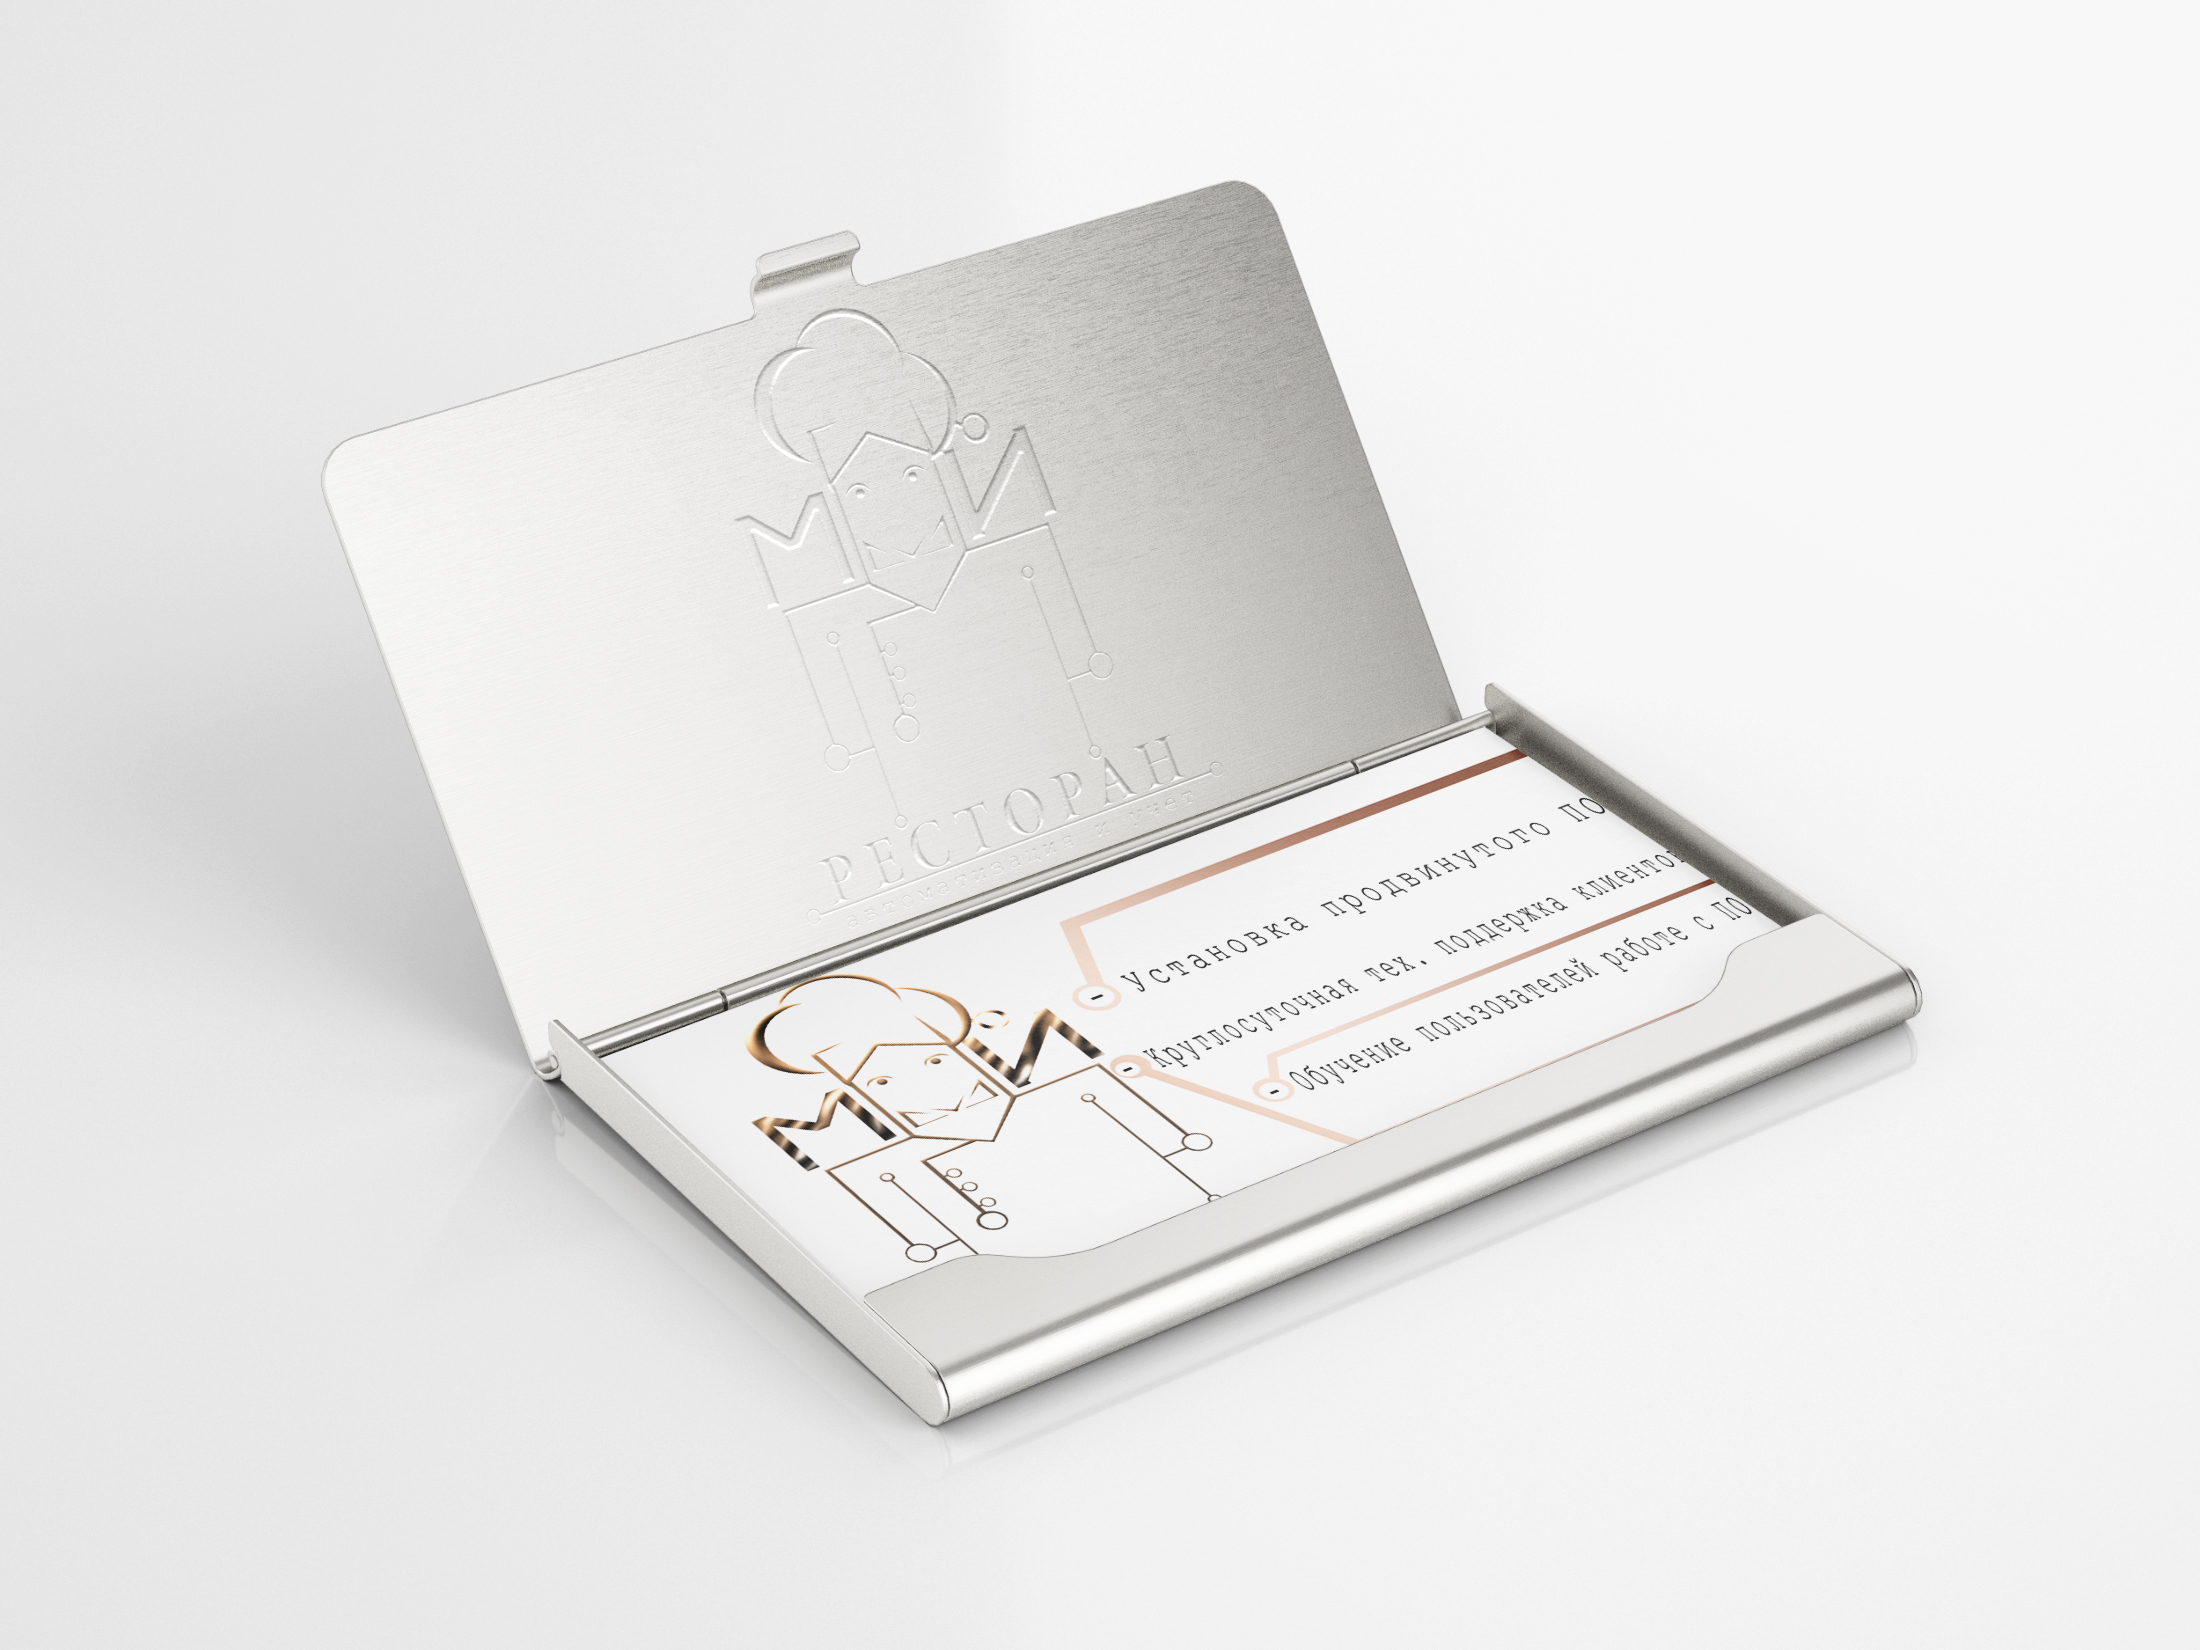 Разработать логотип и фавикон для IT- компании фото f_5735d54236120972.jpg